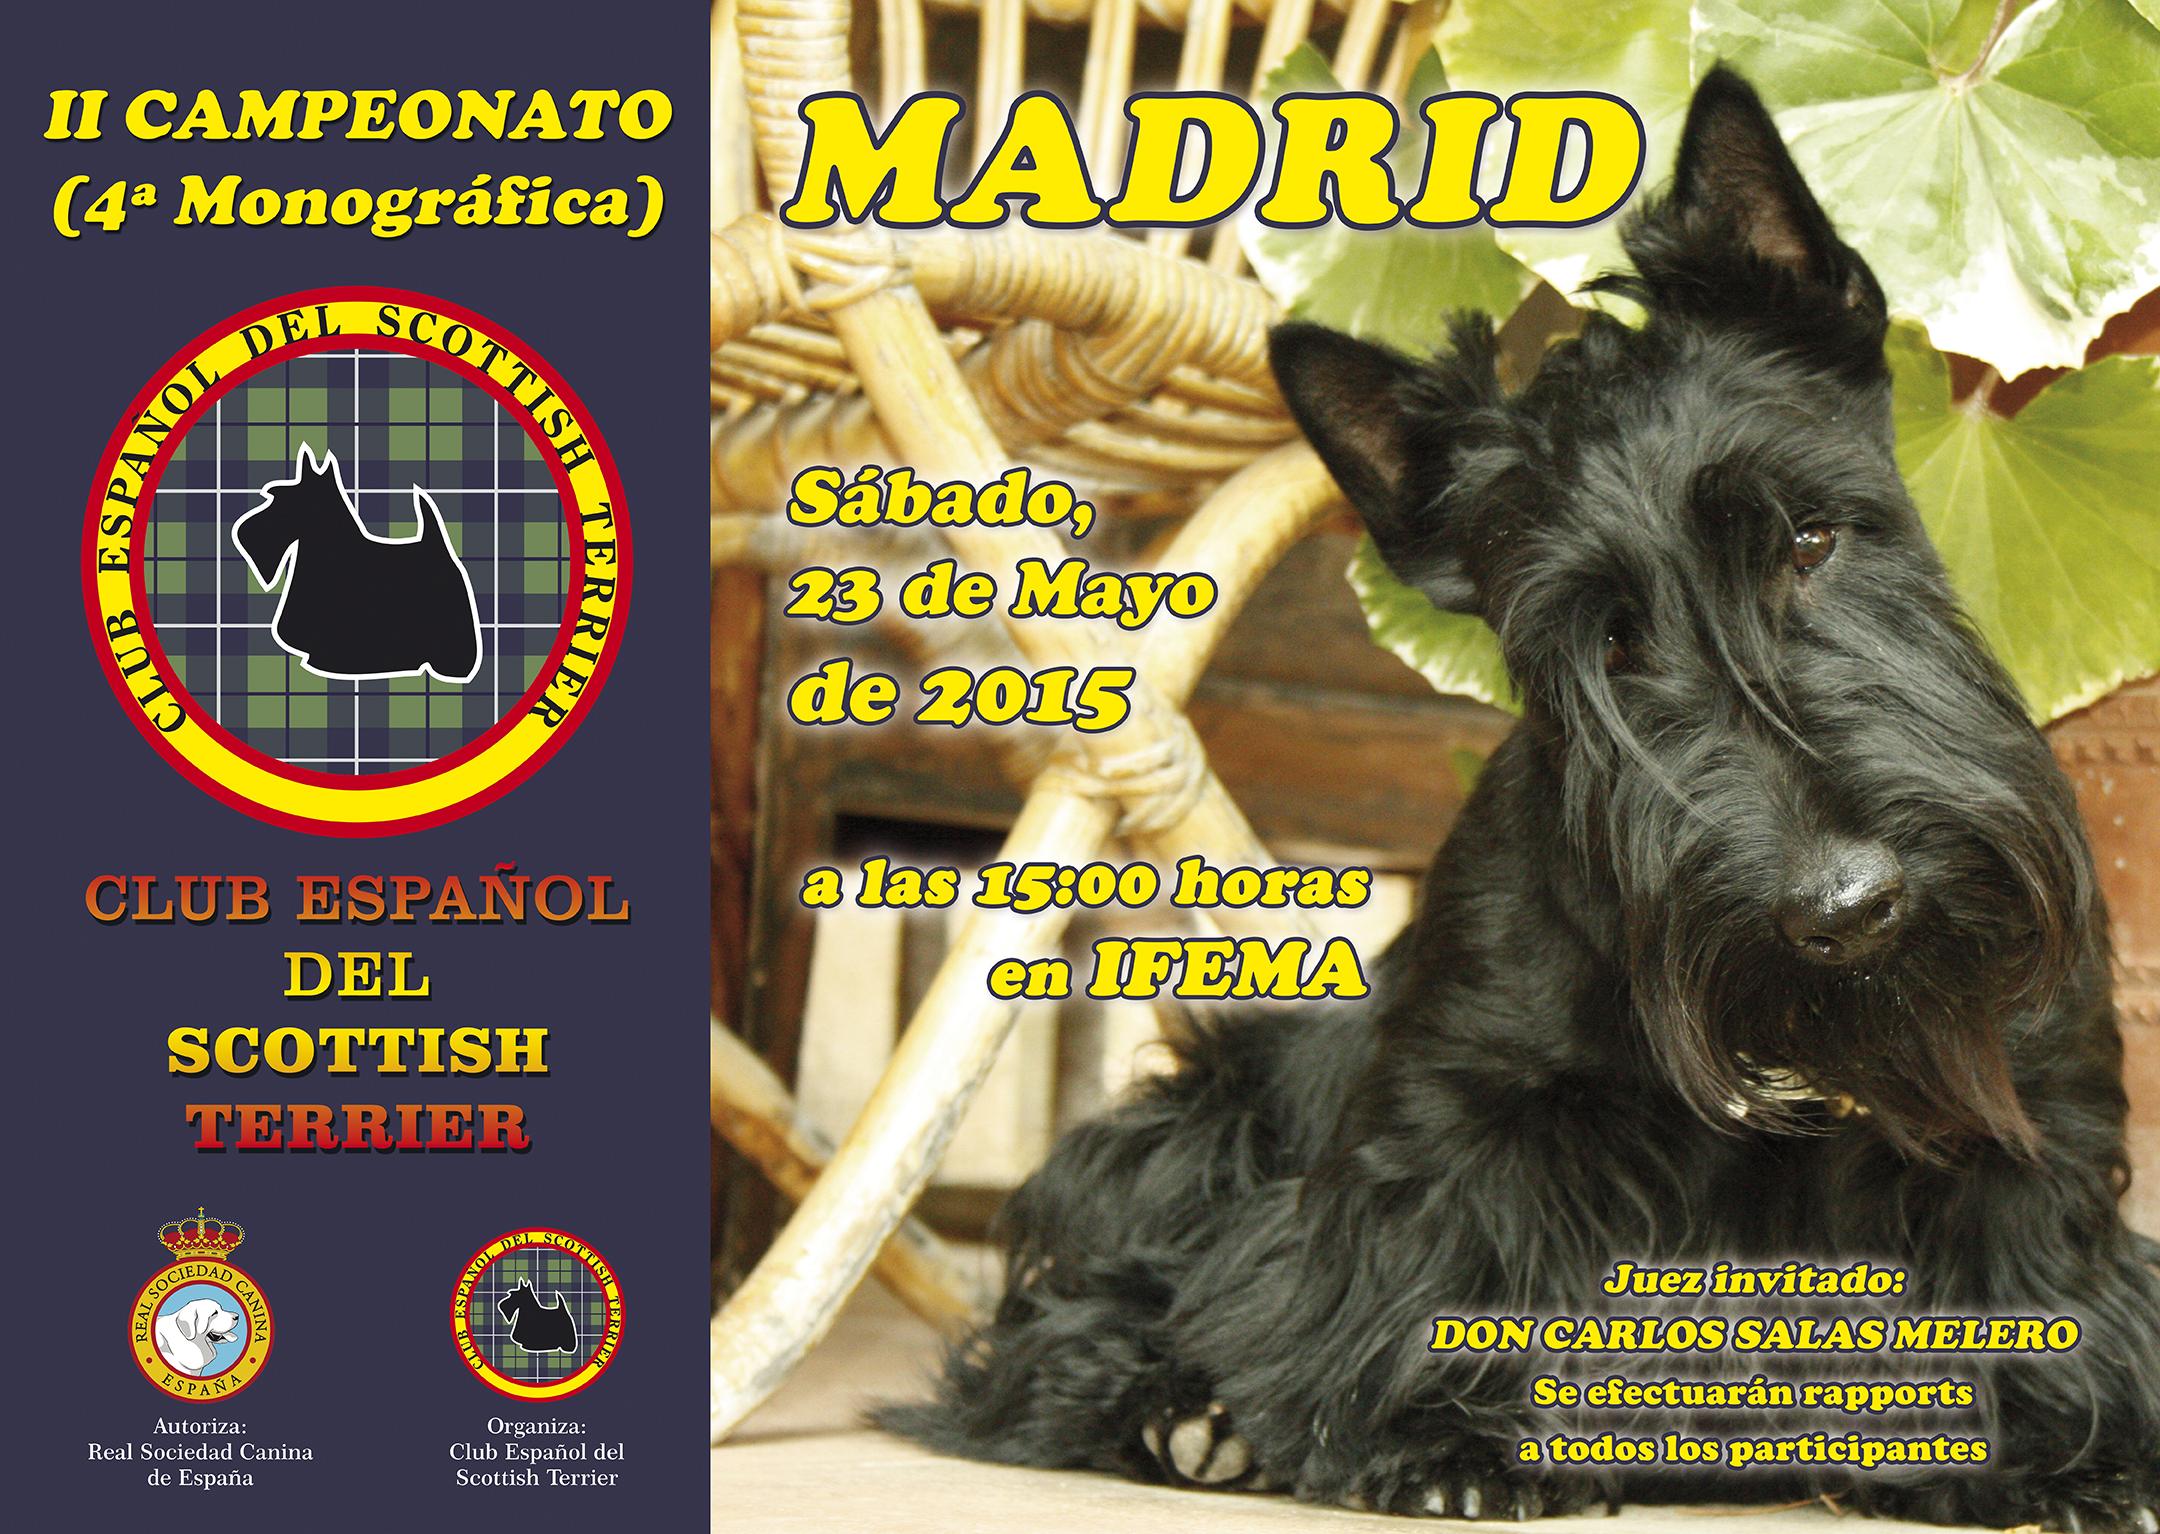 IV Concurso Monografico Madrid cara A